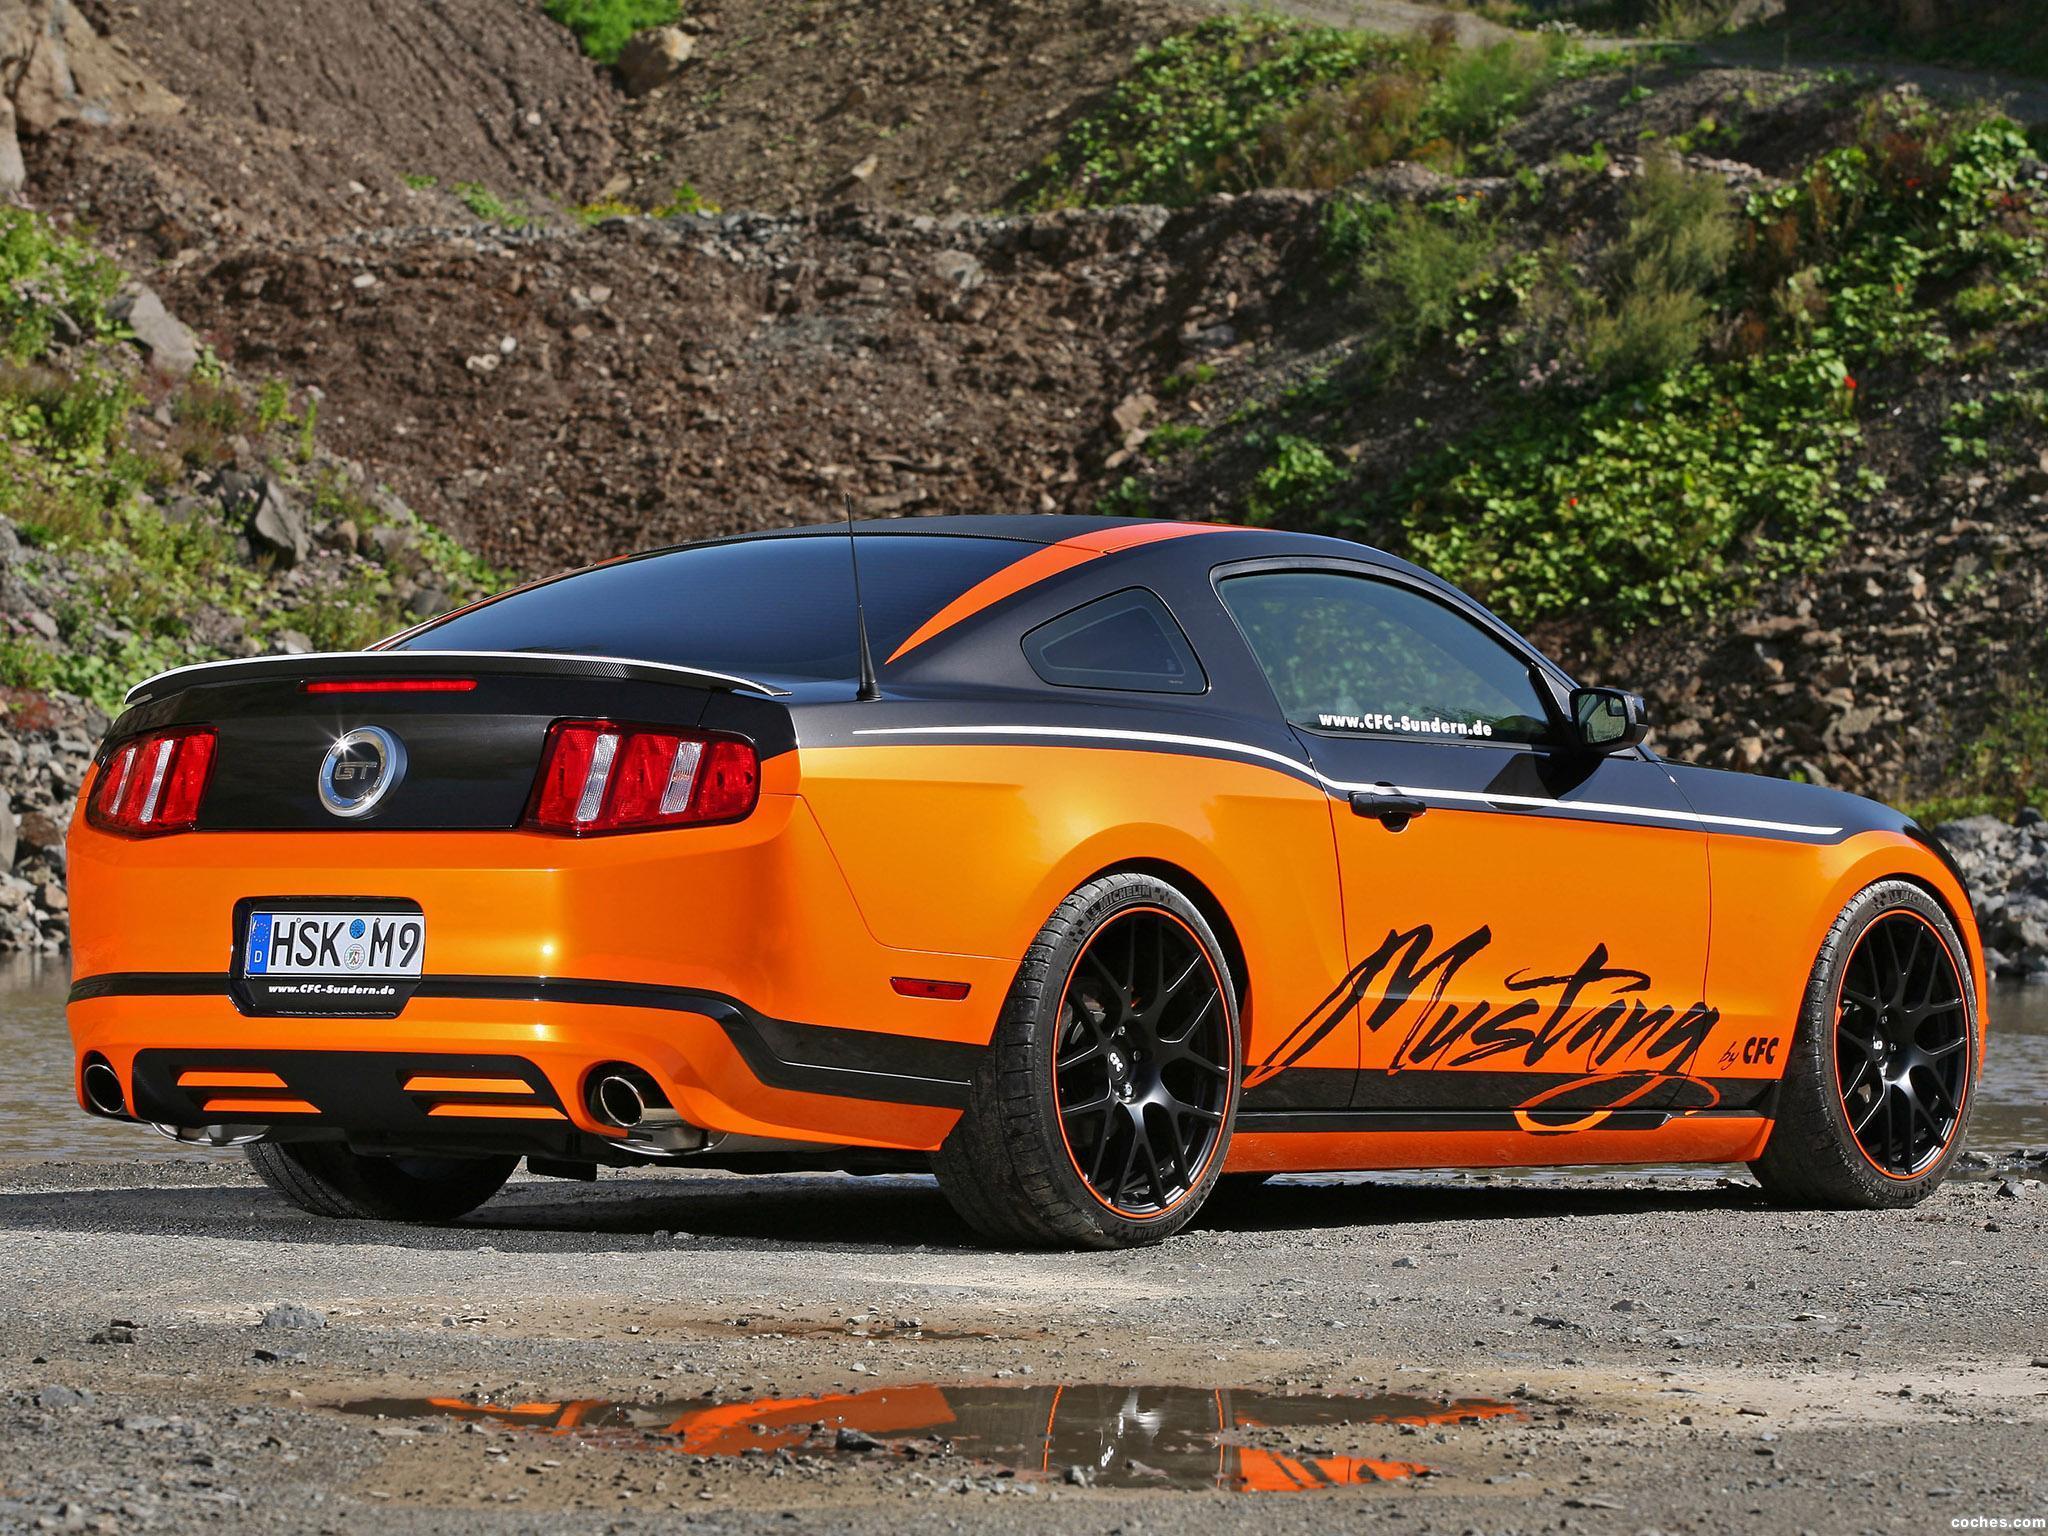 Foto 2 de CFC Ford Mustang Sundern World Marko Mennekes 2011